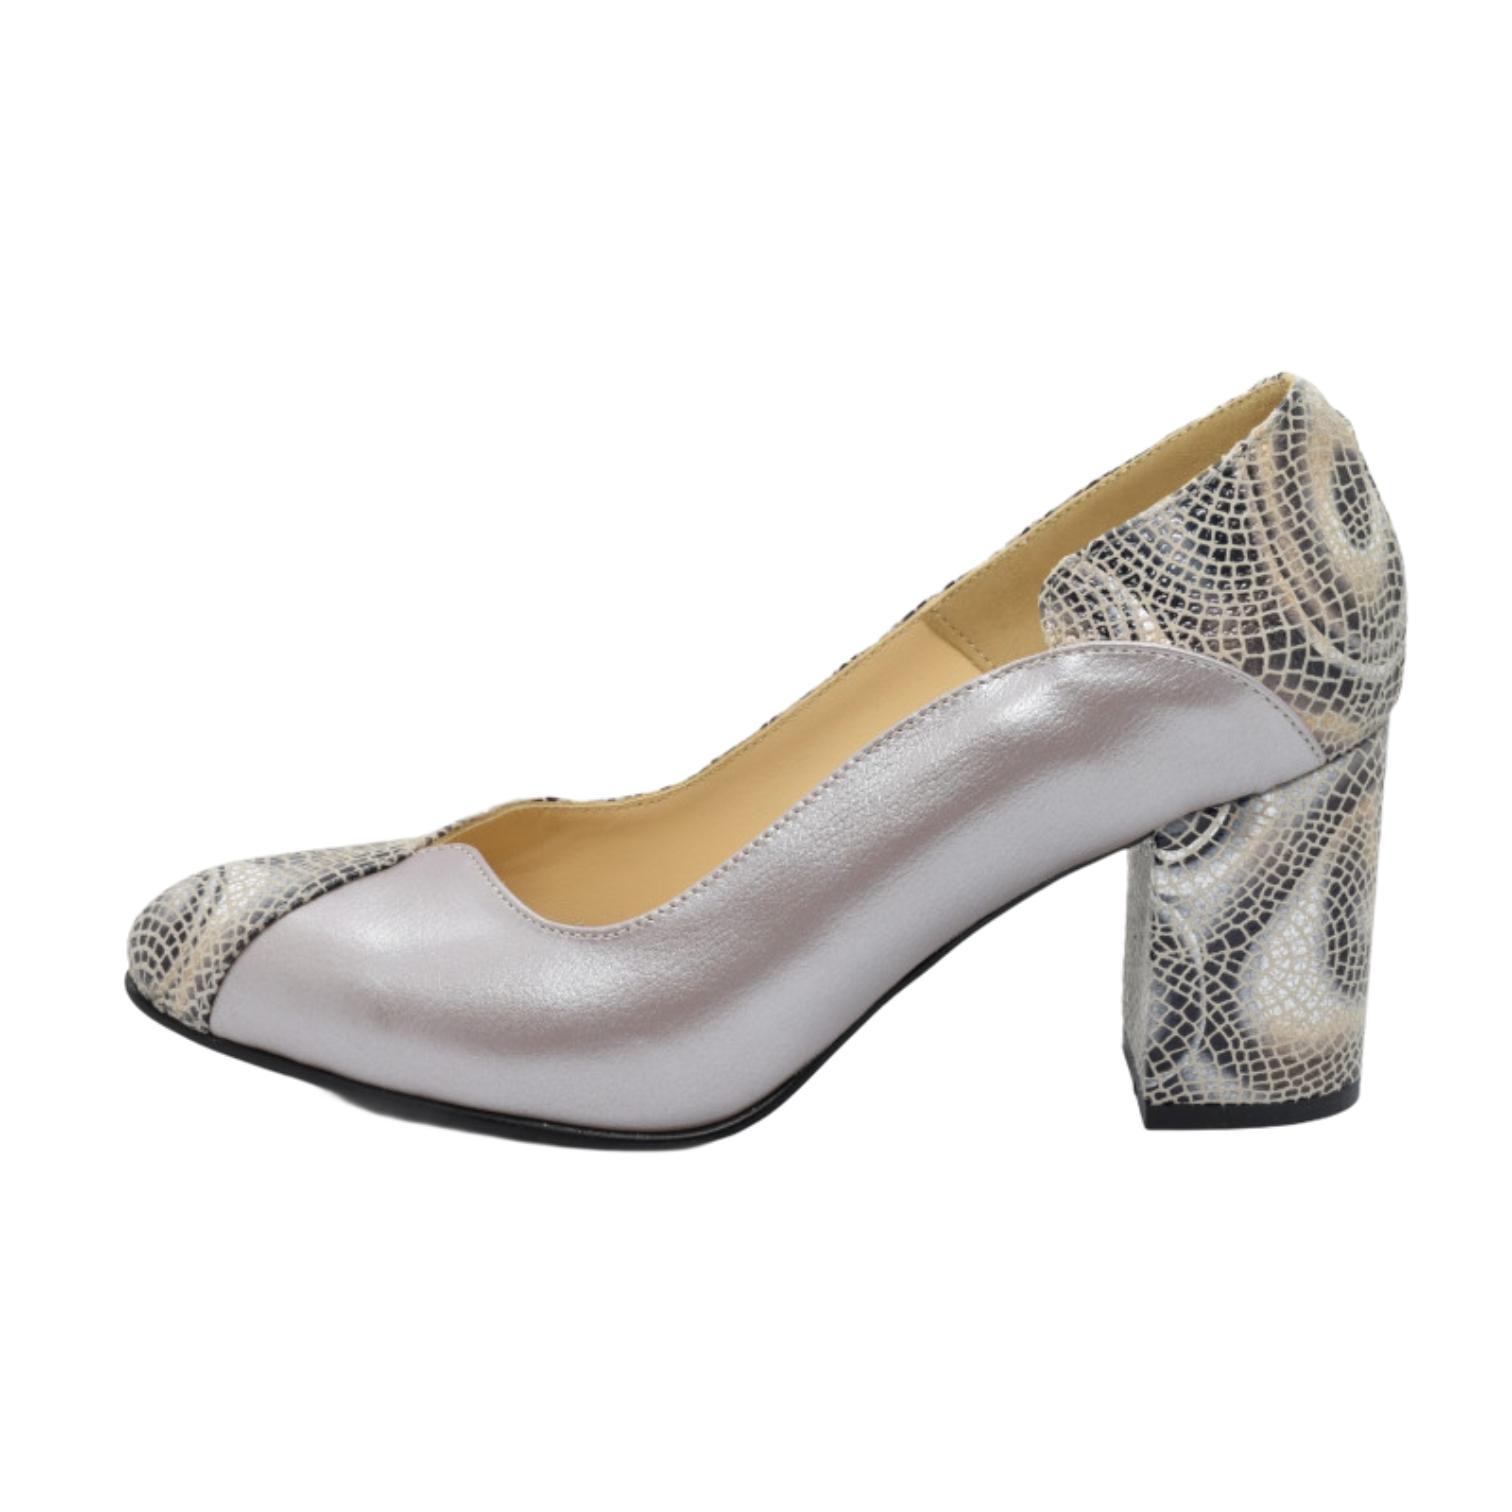 Pantofi argintii cu model abstract